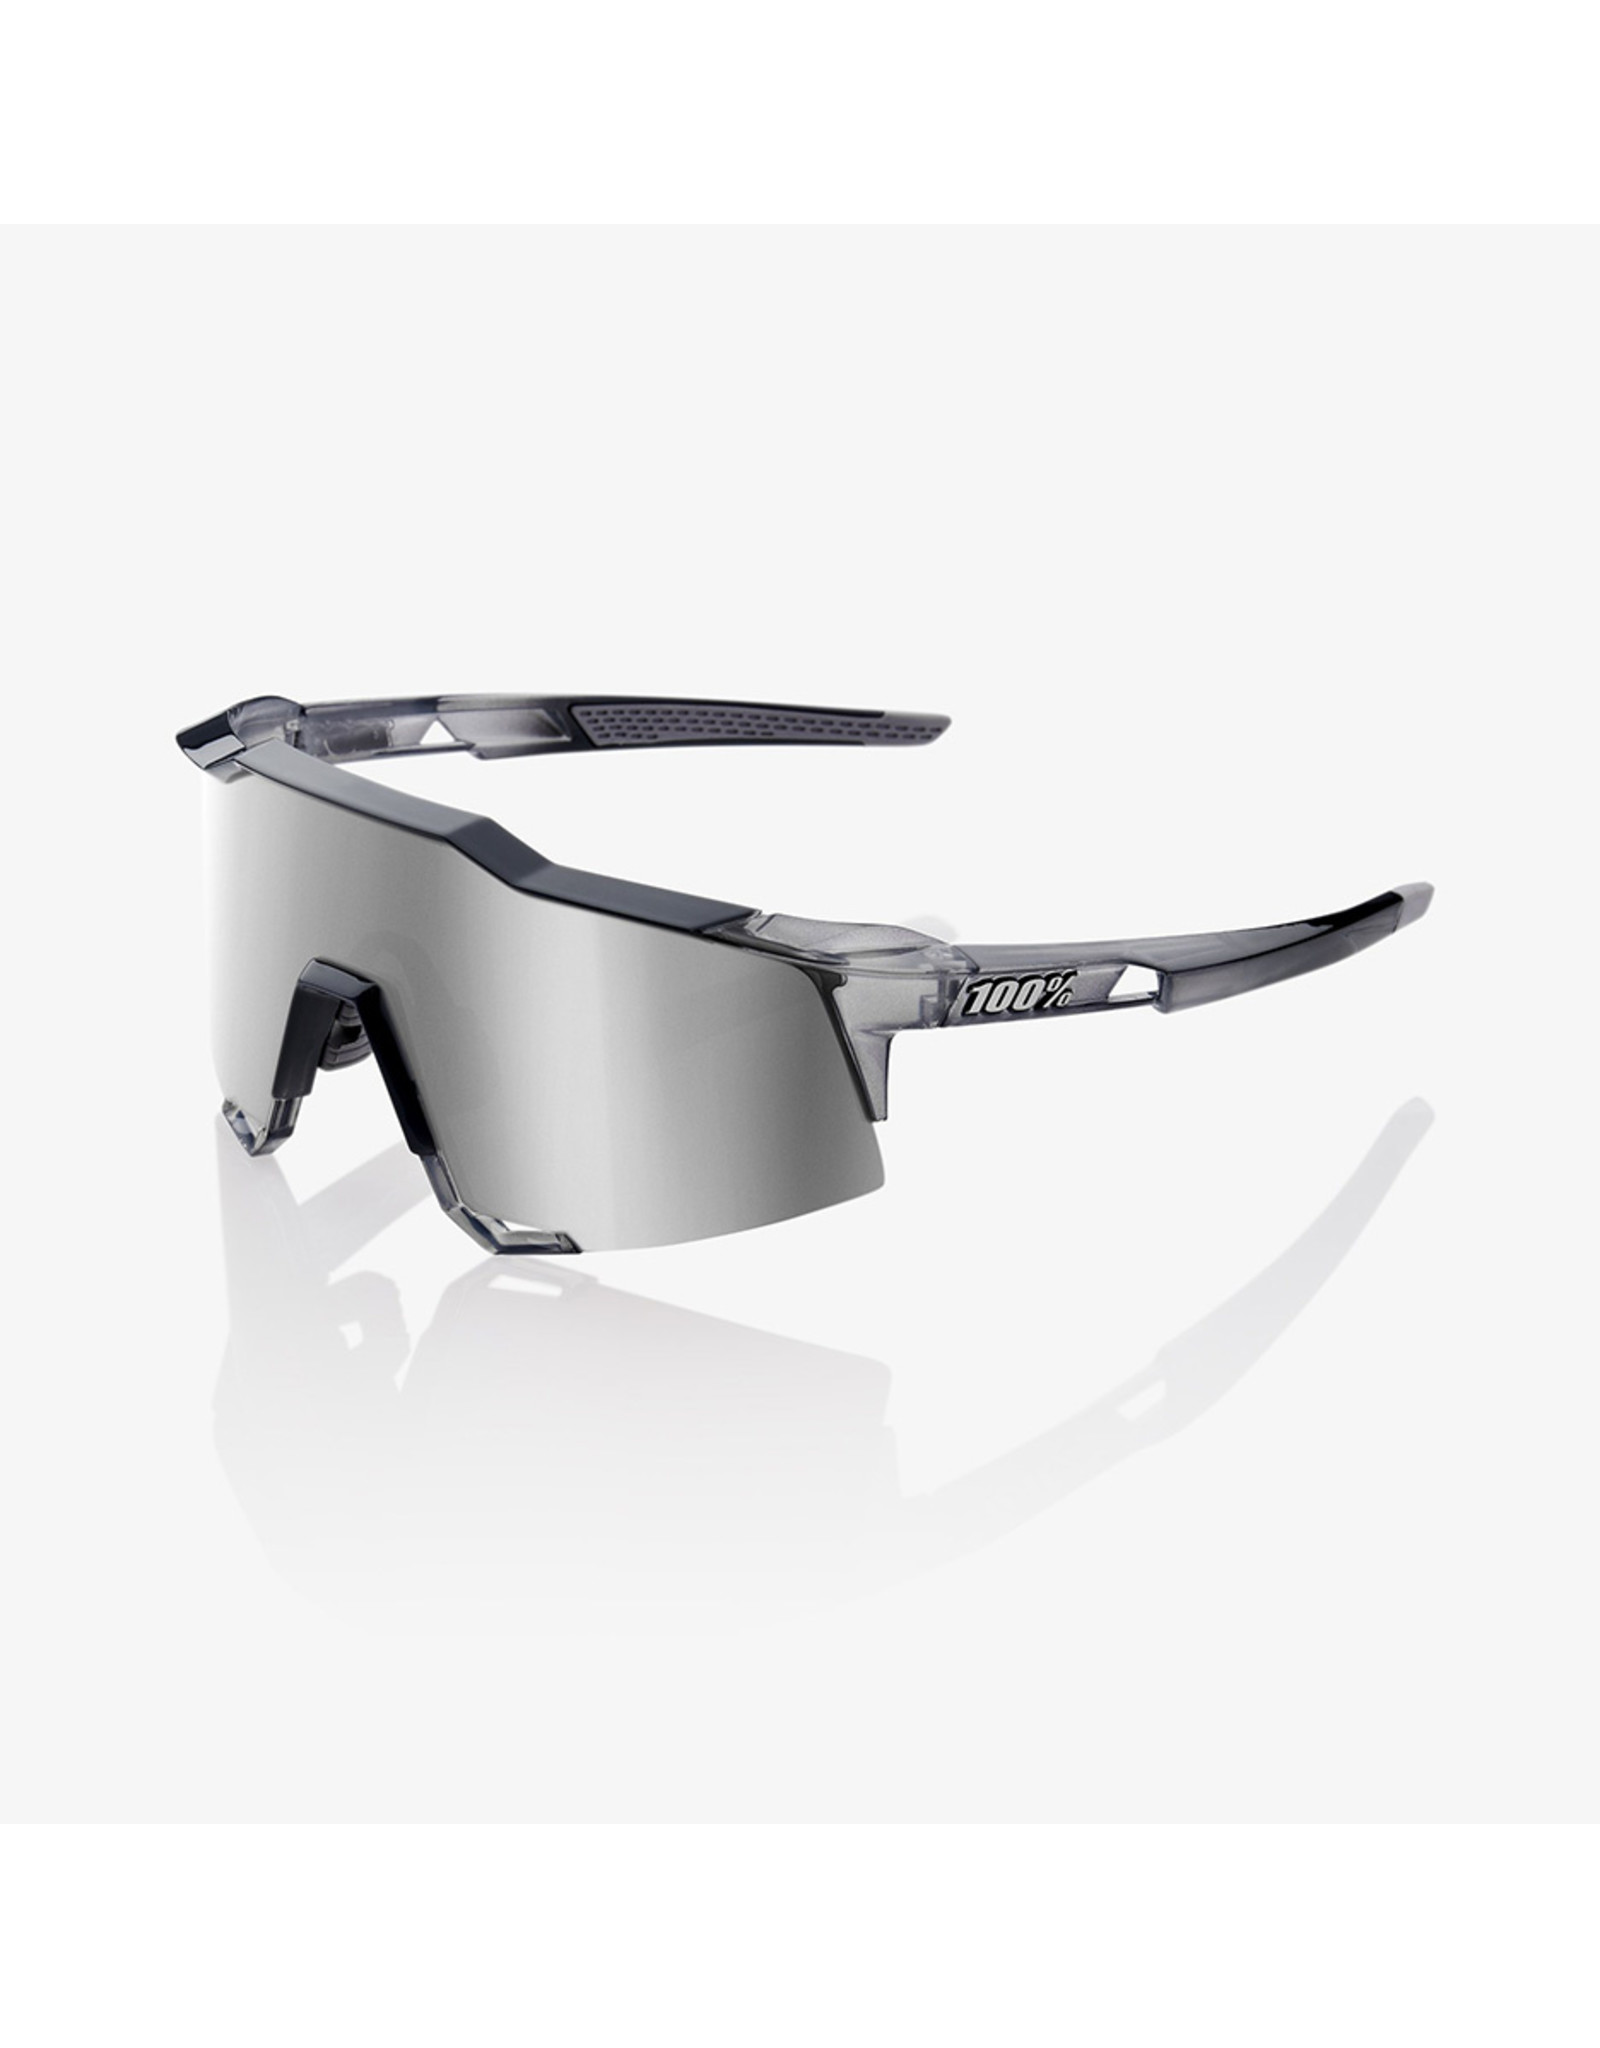 100% 100% Speedcraft Polished Translucent Crystal Grey Hiper Silver Lens